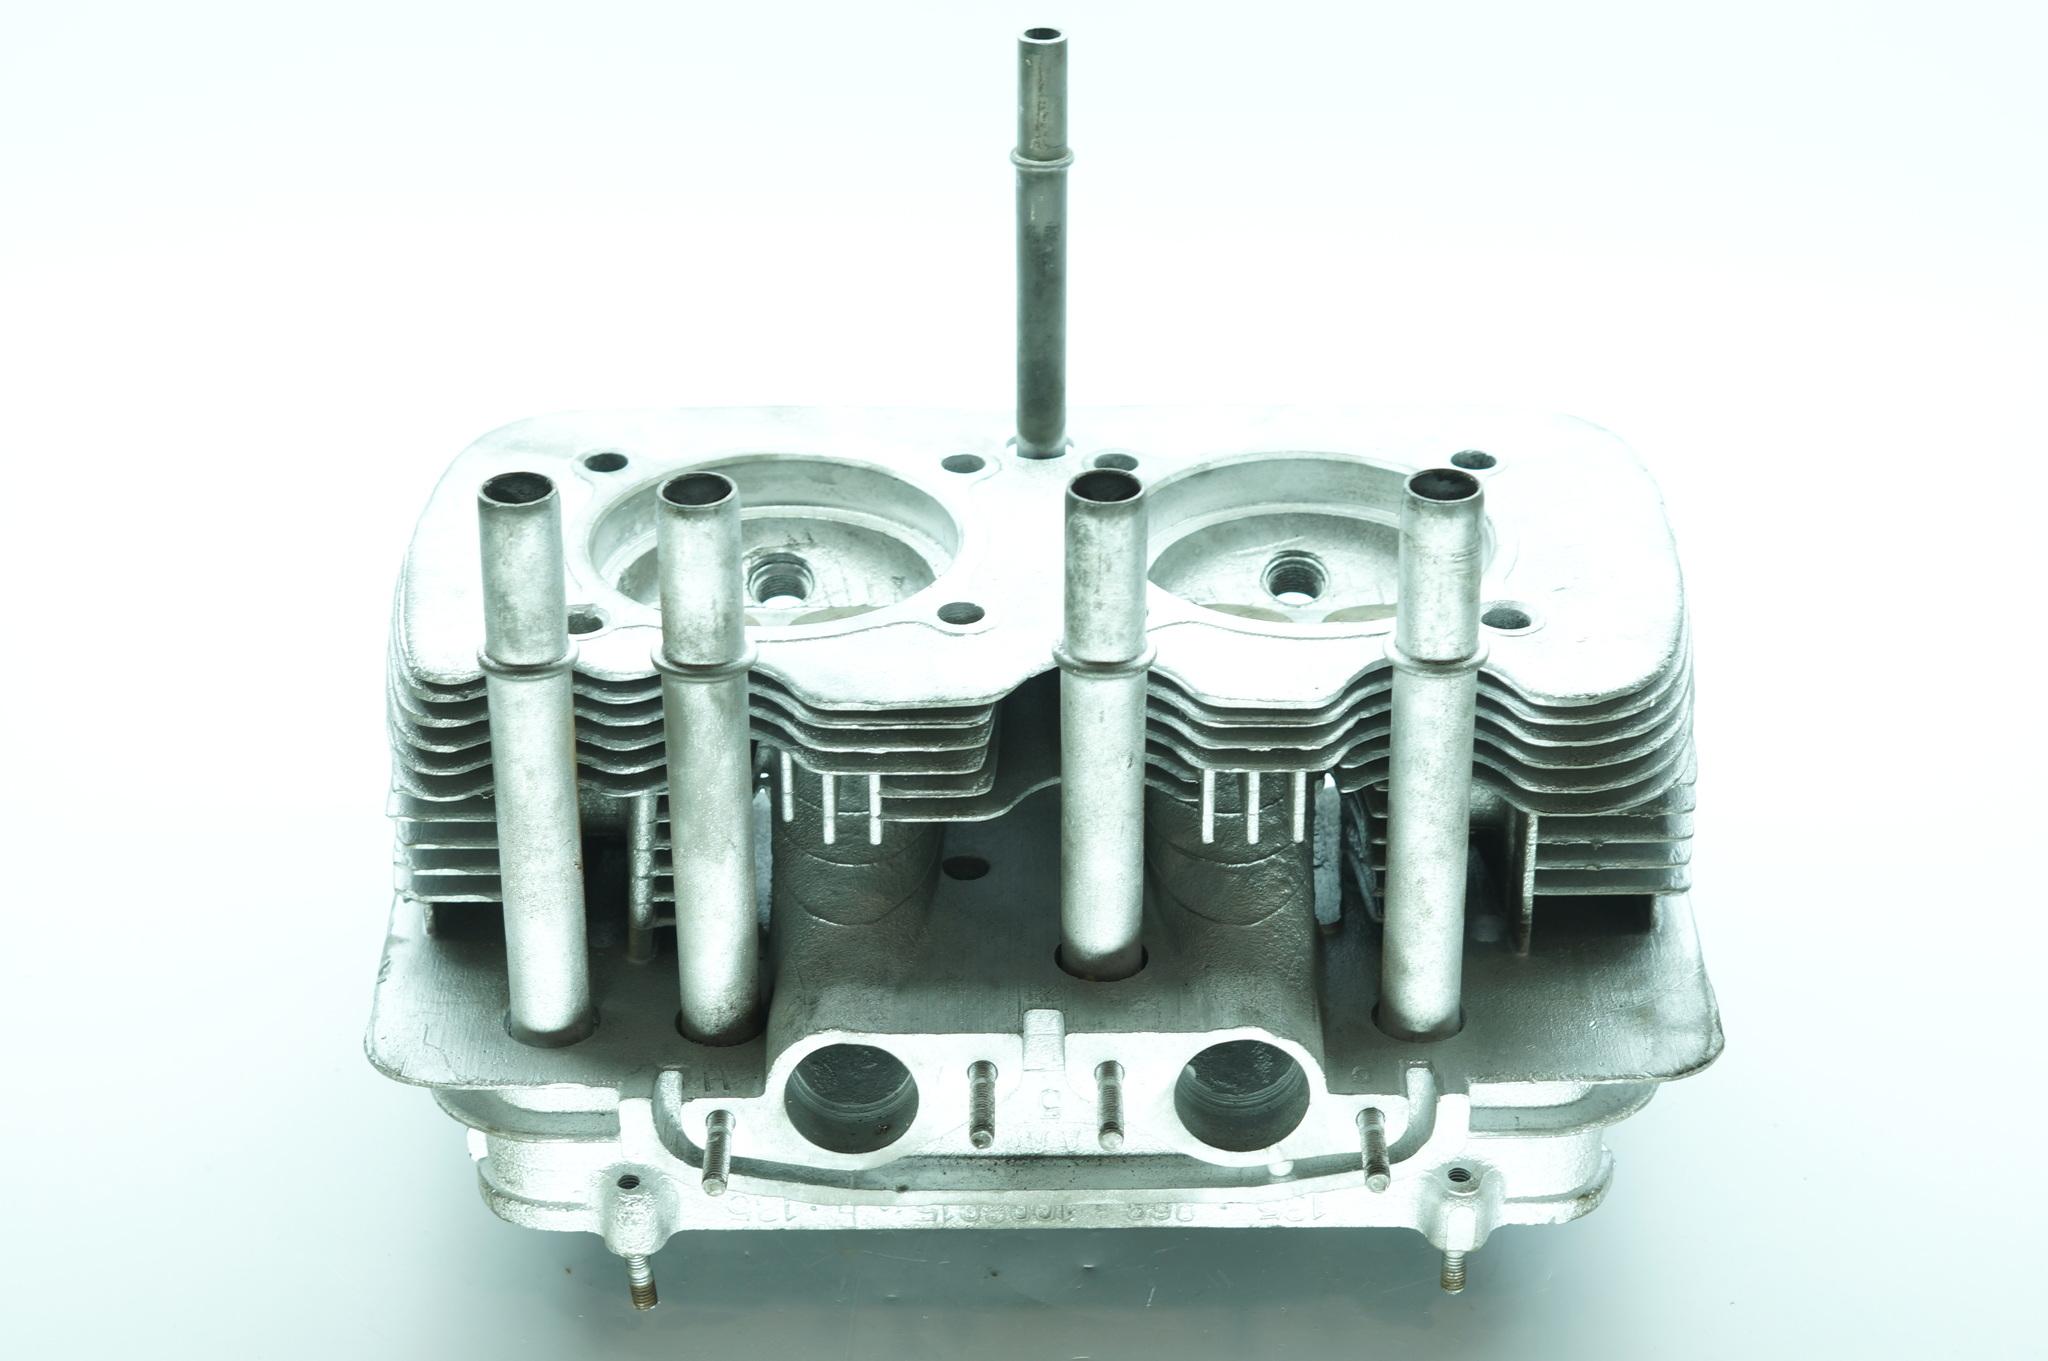 Головка блока цилиндра в сборе двигателя Заз 968 40 л.с.